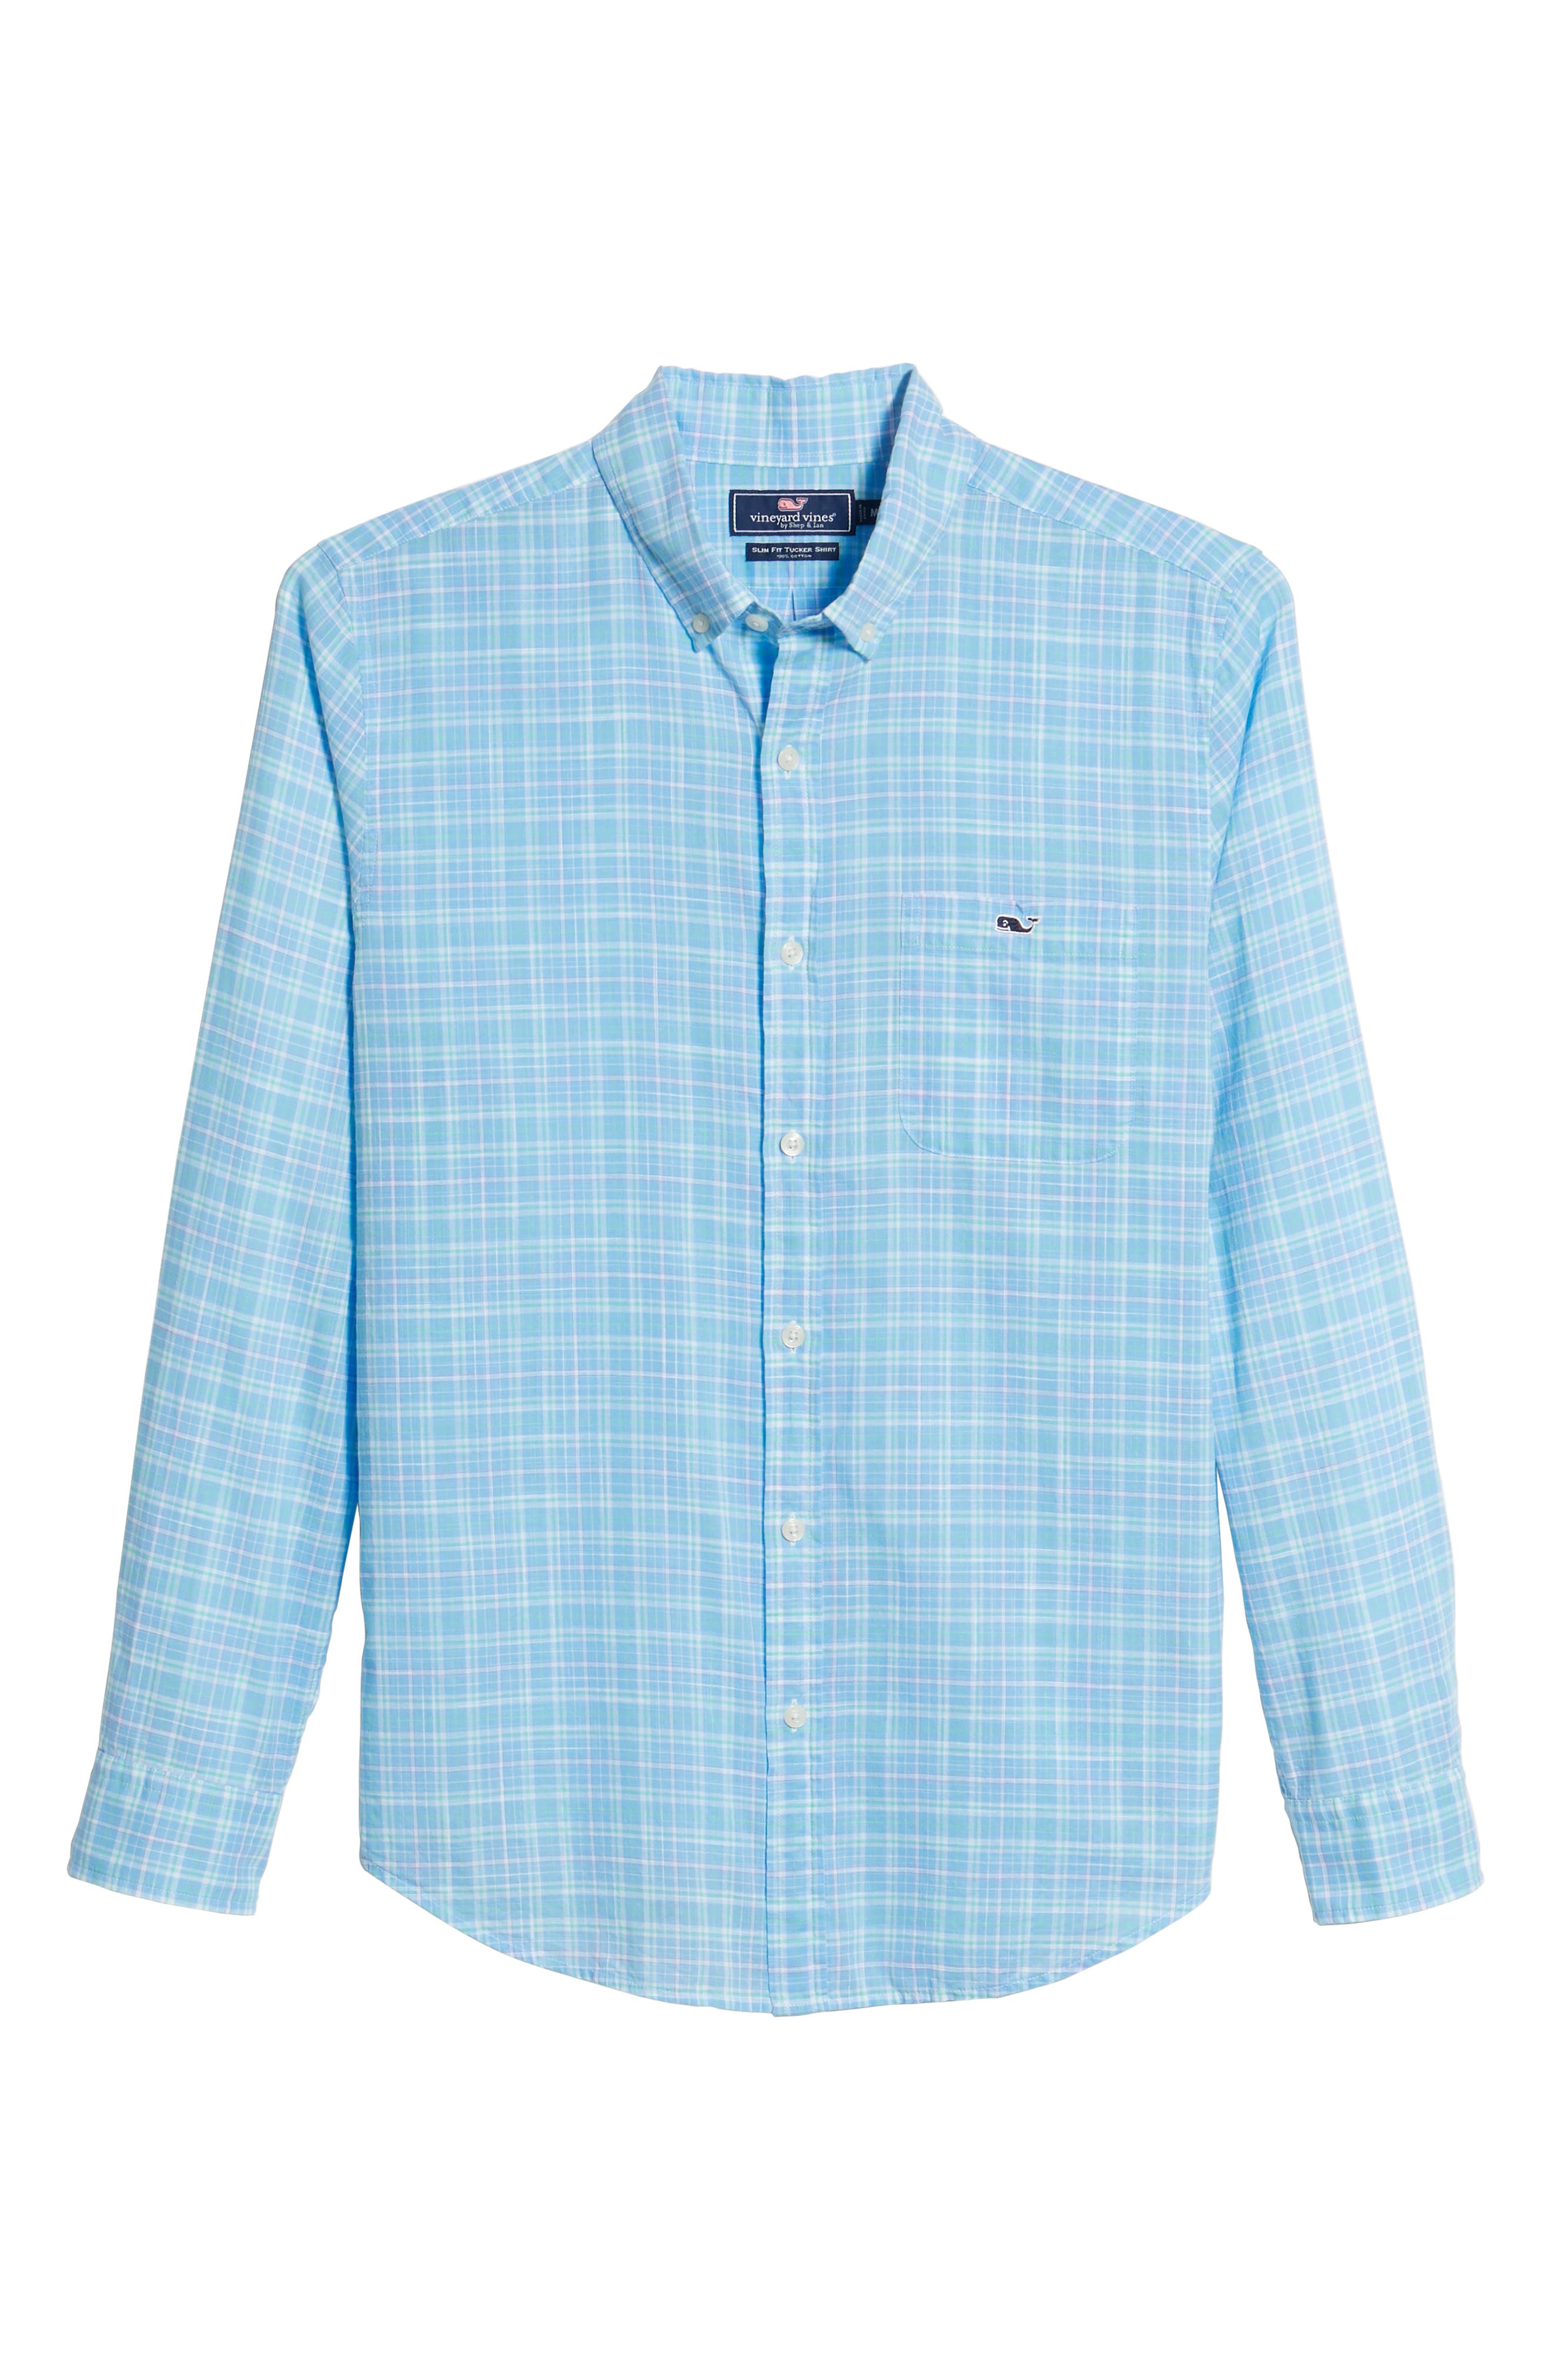 Stoney Hill Tucker Classic Fit Plaid Sport Shirt,                             Alternate thumbnail 6, color,                             415